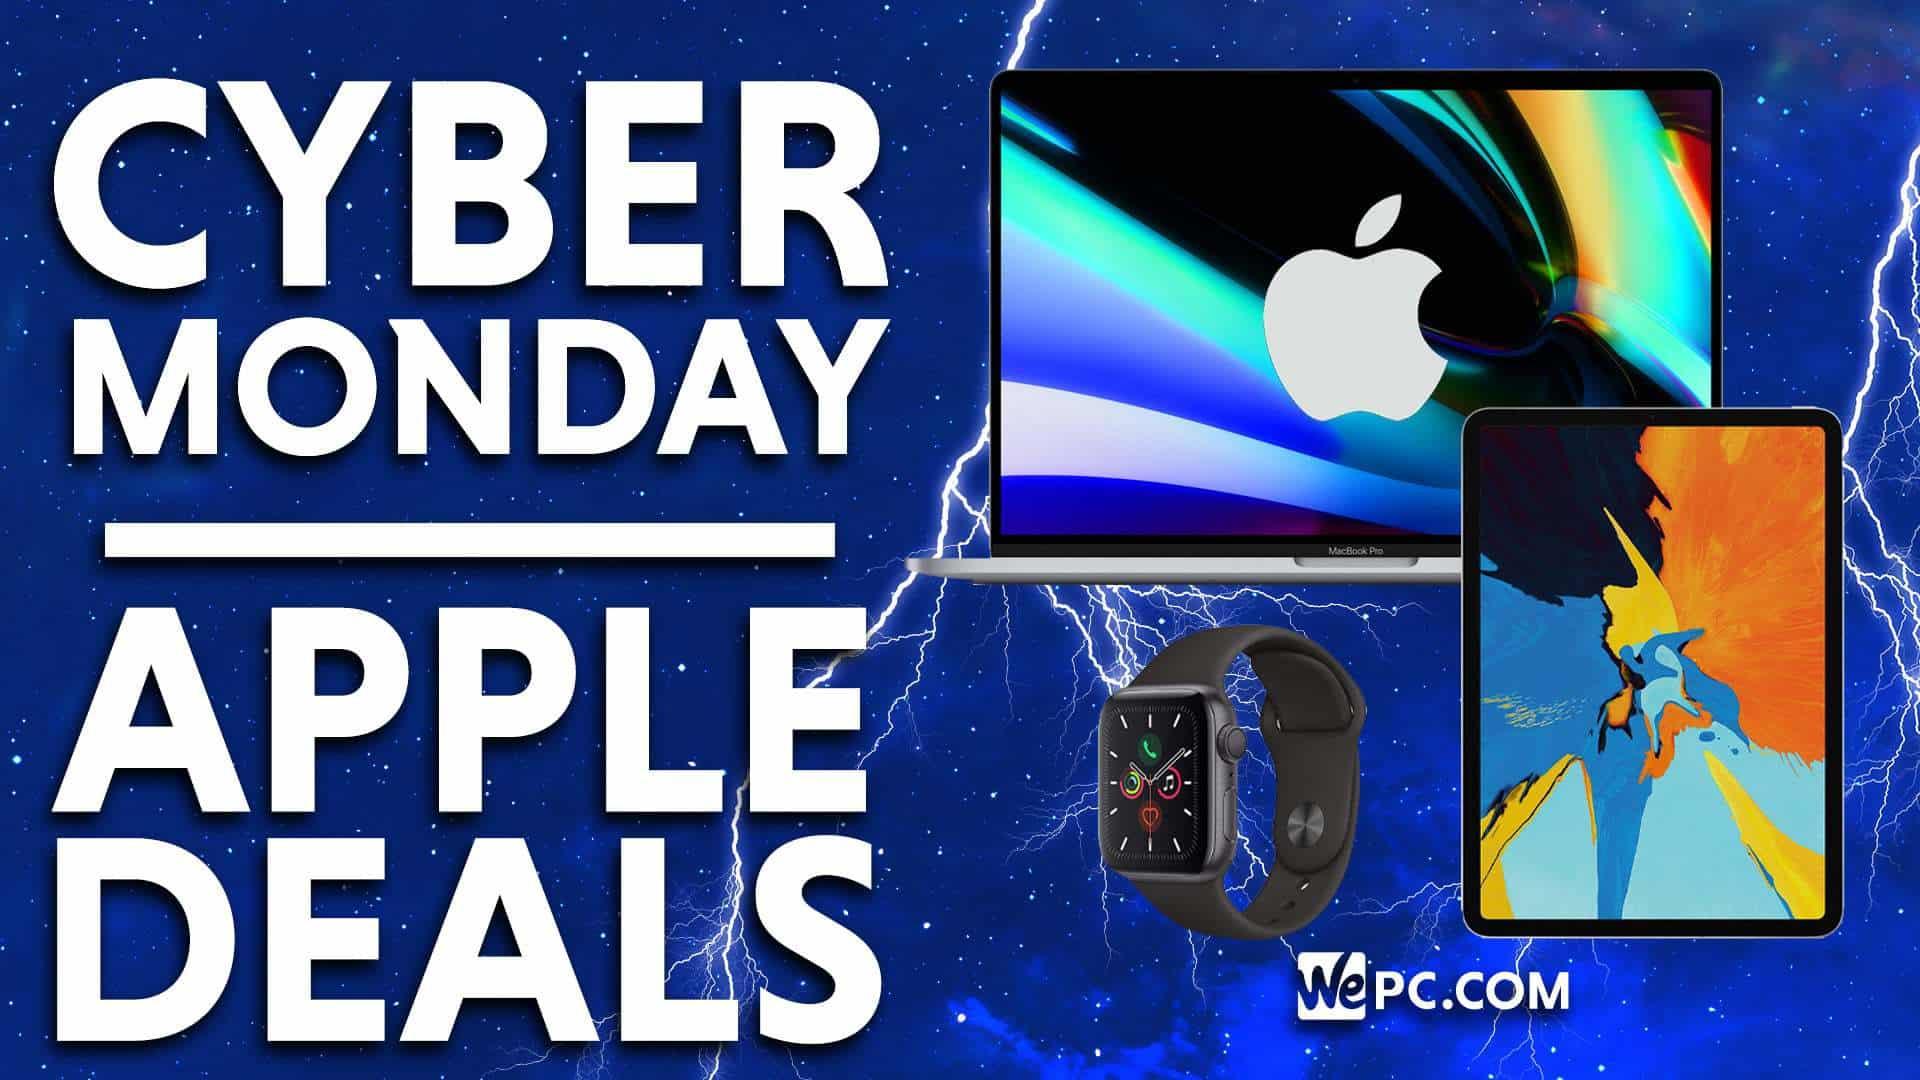 Apple Cyber Monday Deals 2020 Wepc